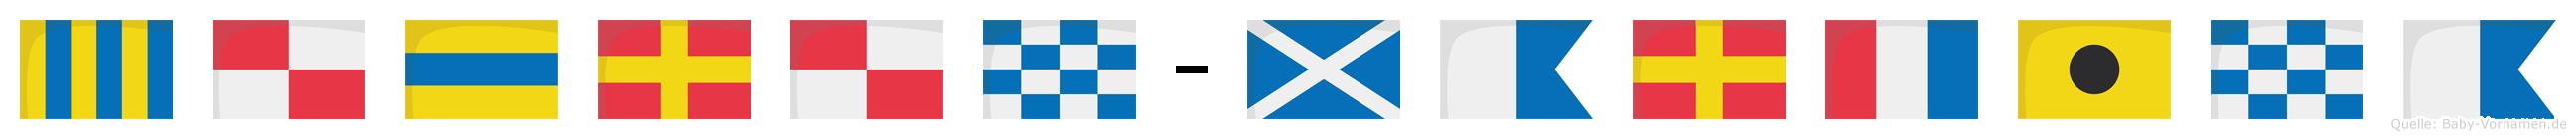 Gudrun-Martina im Flaggenalphabet